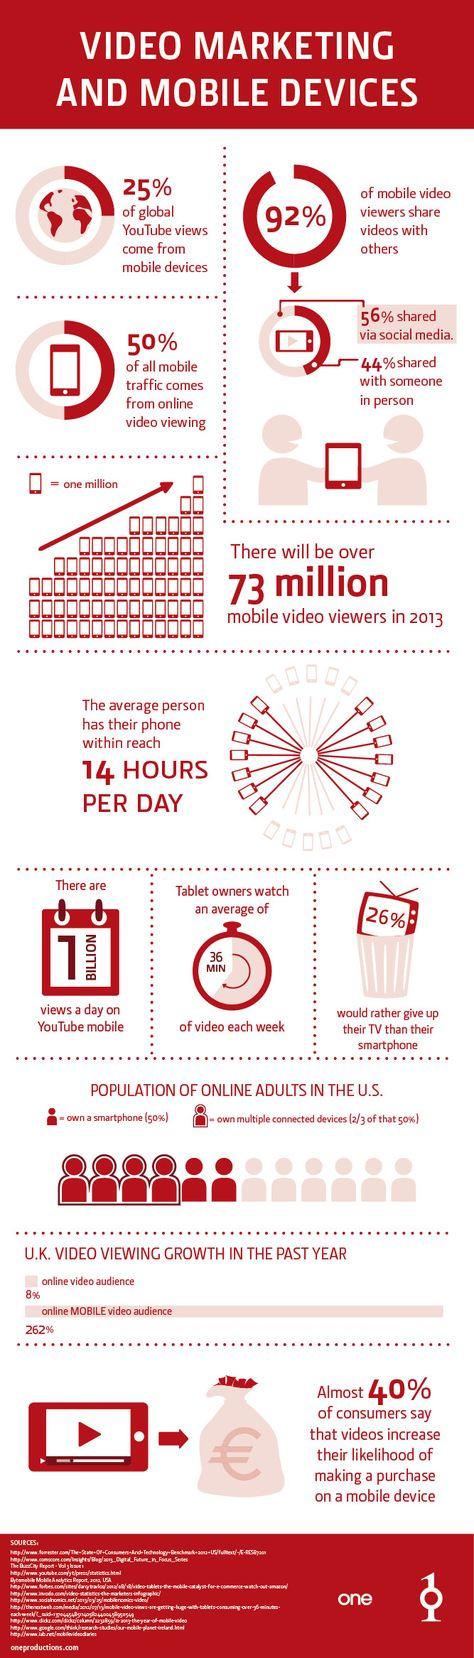 Video Marketing Services - Video SEO